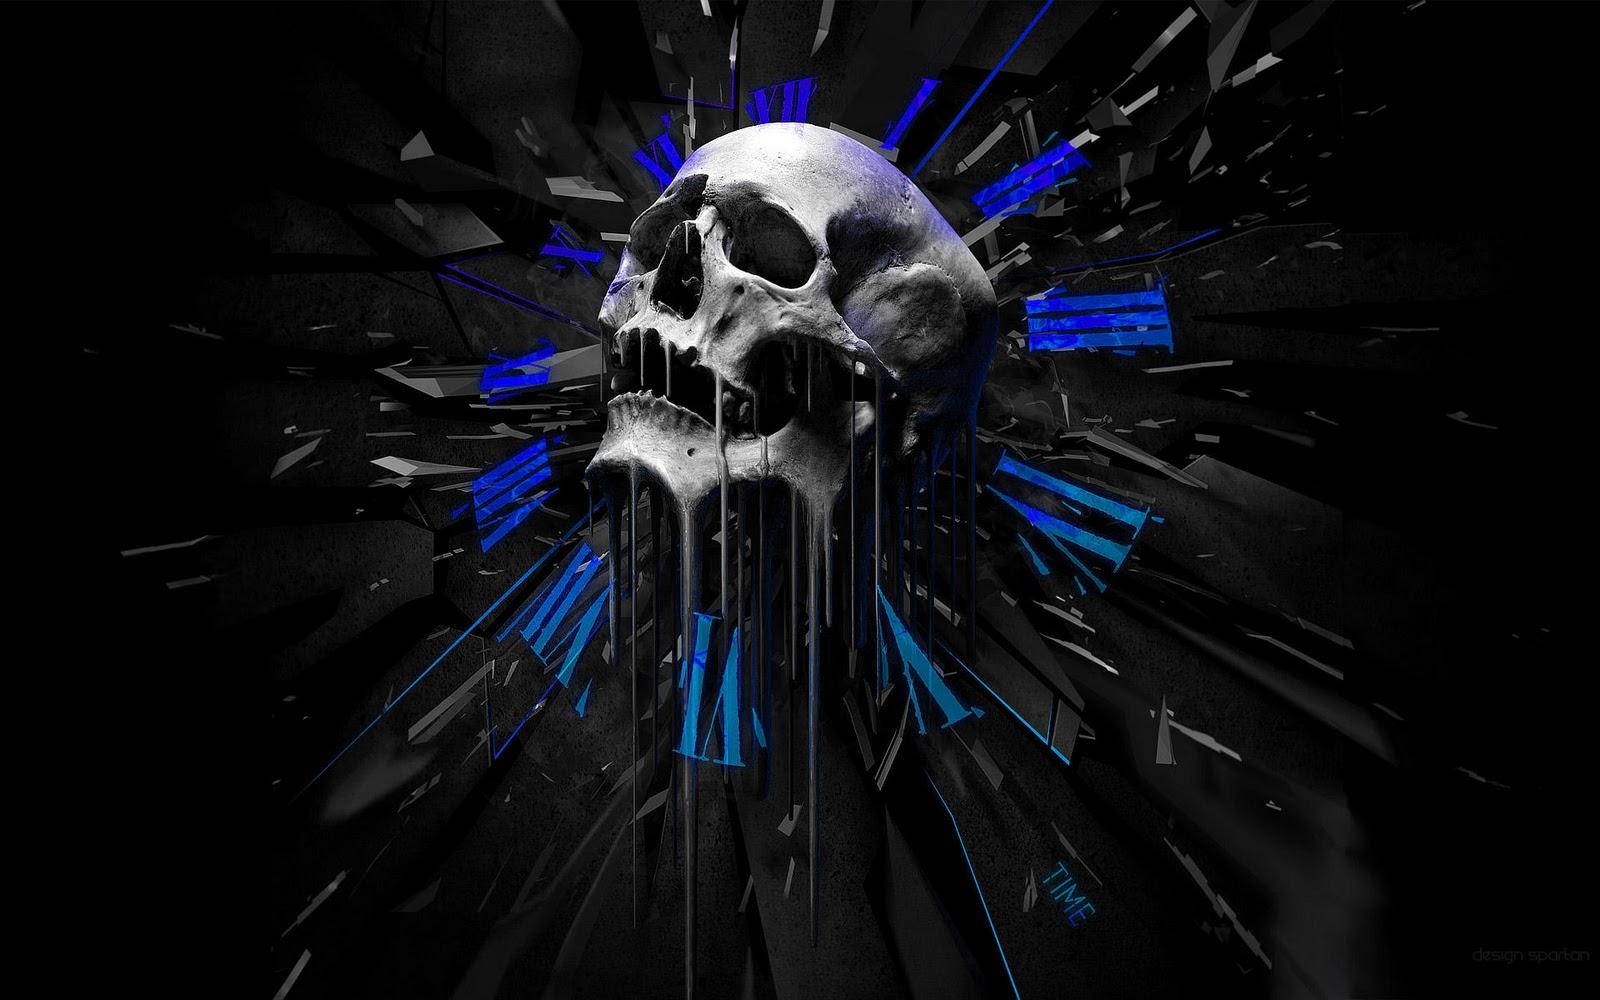 Skull Wallpapers Skeleton Wallpapers 3DWallpapers cini 1600x1000